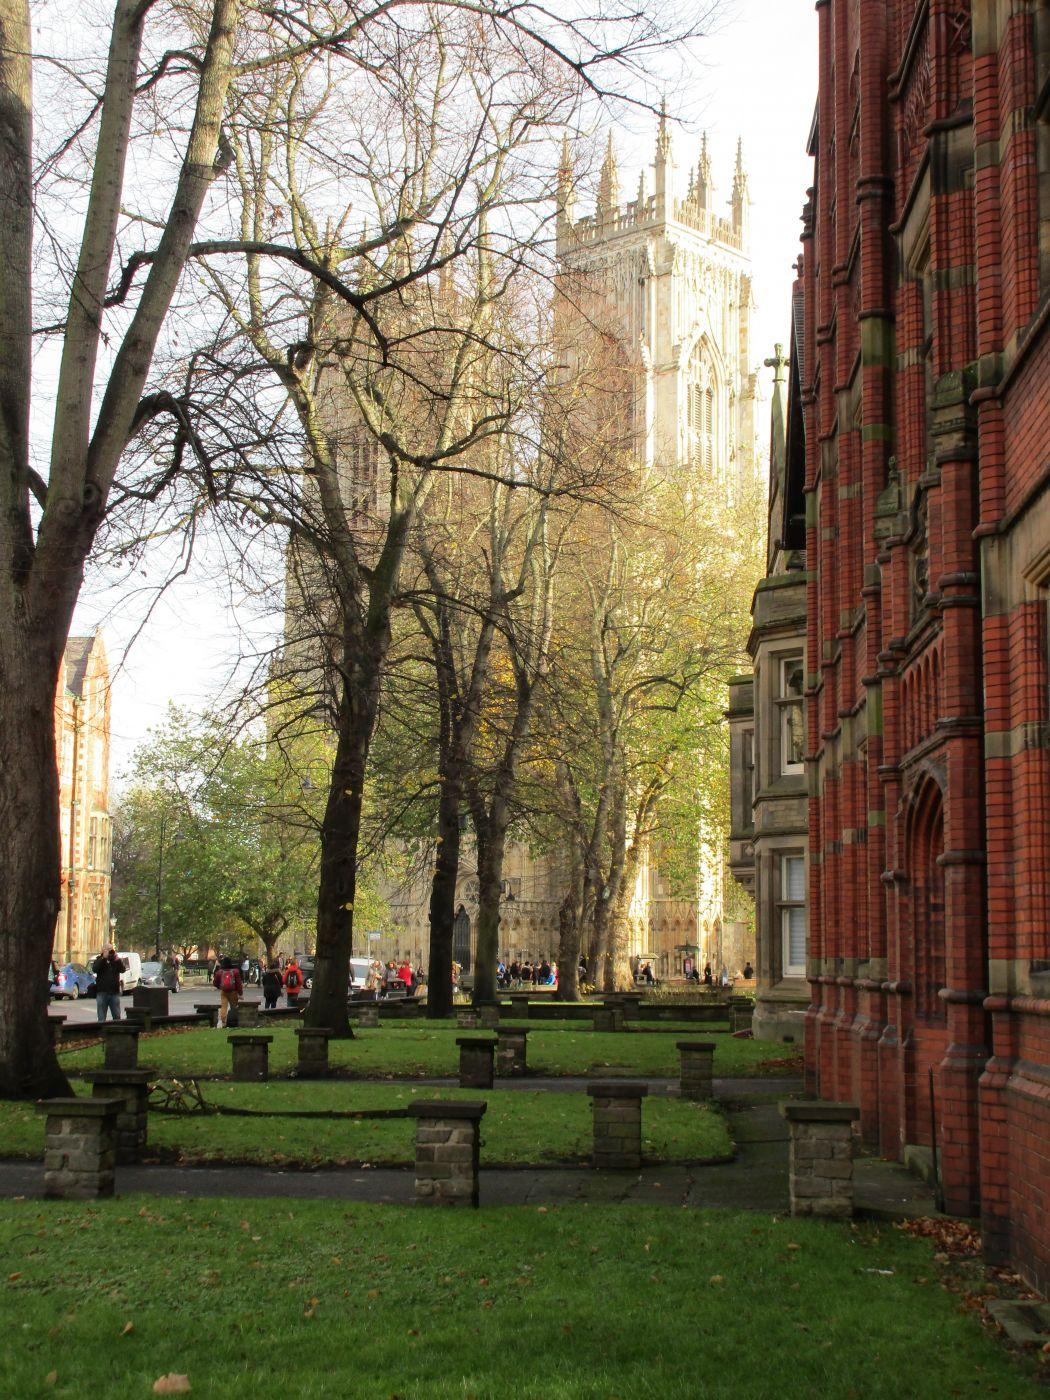 York Minister/ York Cathedral, United Kingdom